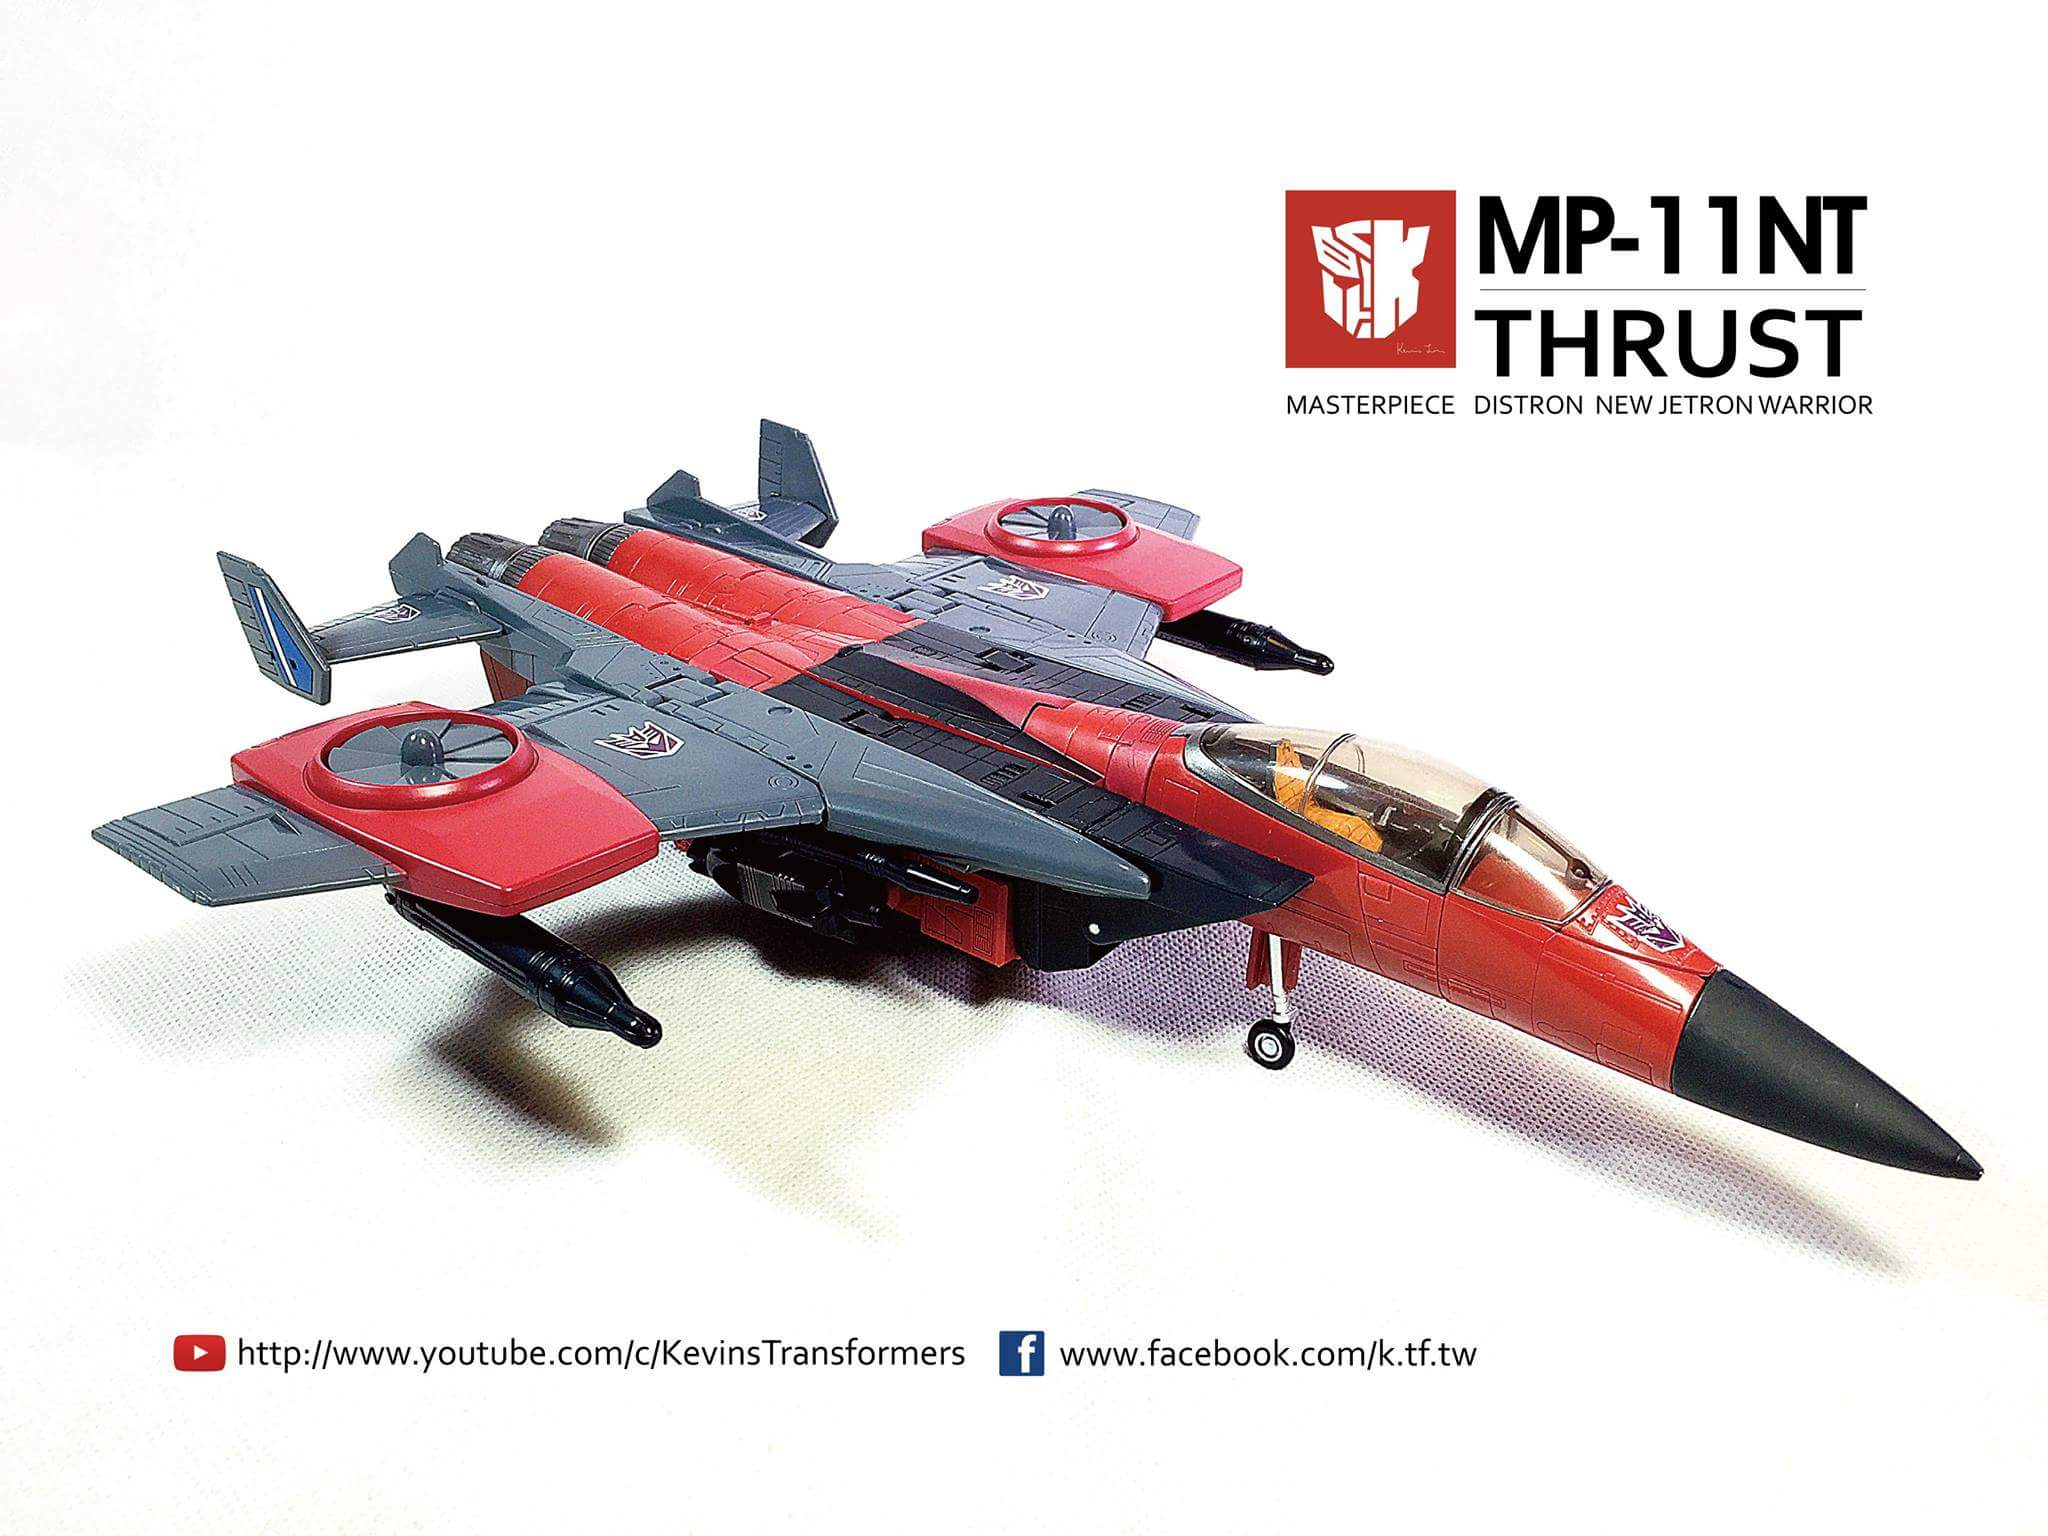 [Masterpiece] MP-11NT Thrust/Fatalo par Takara Tomy - Page 2 QSIb6lrL